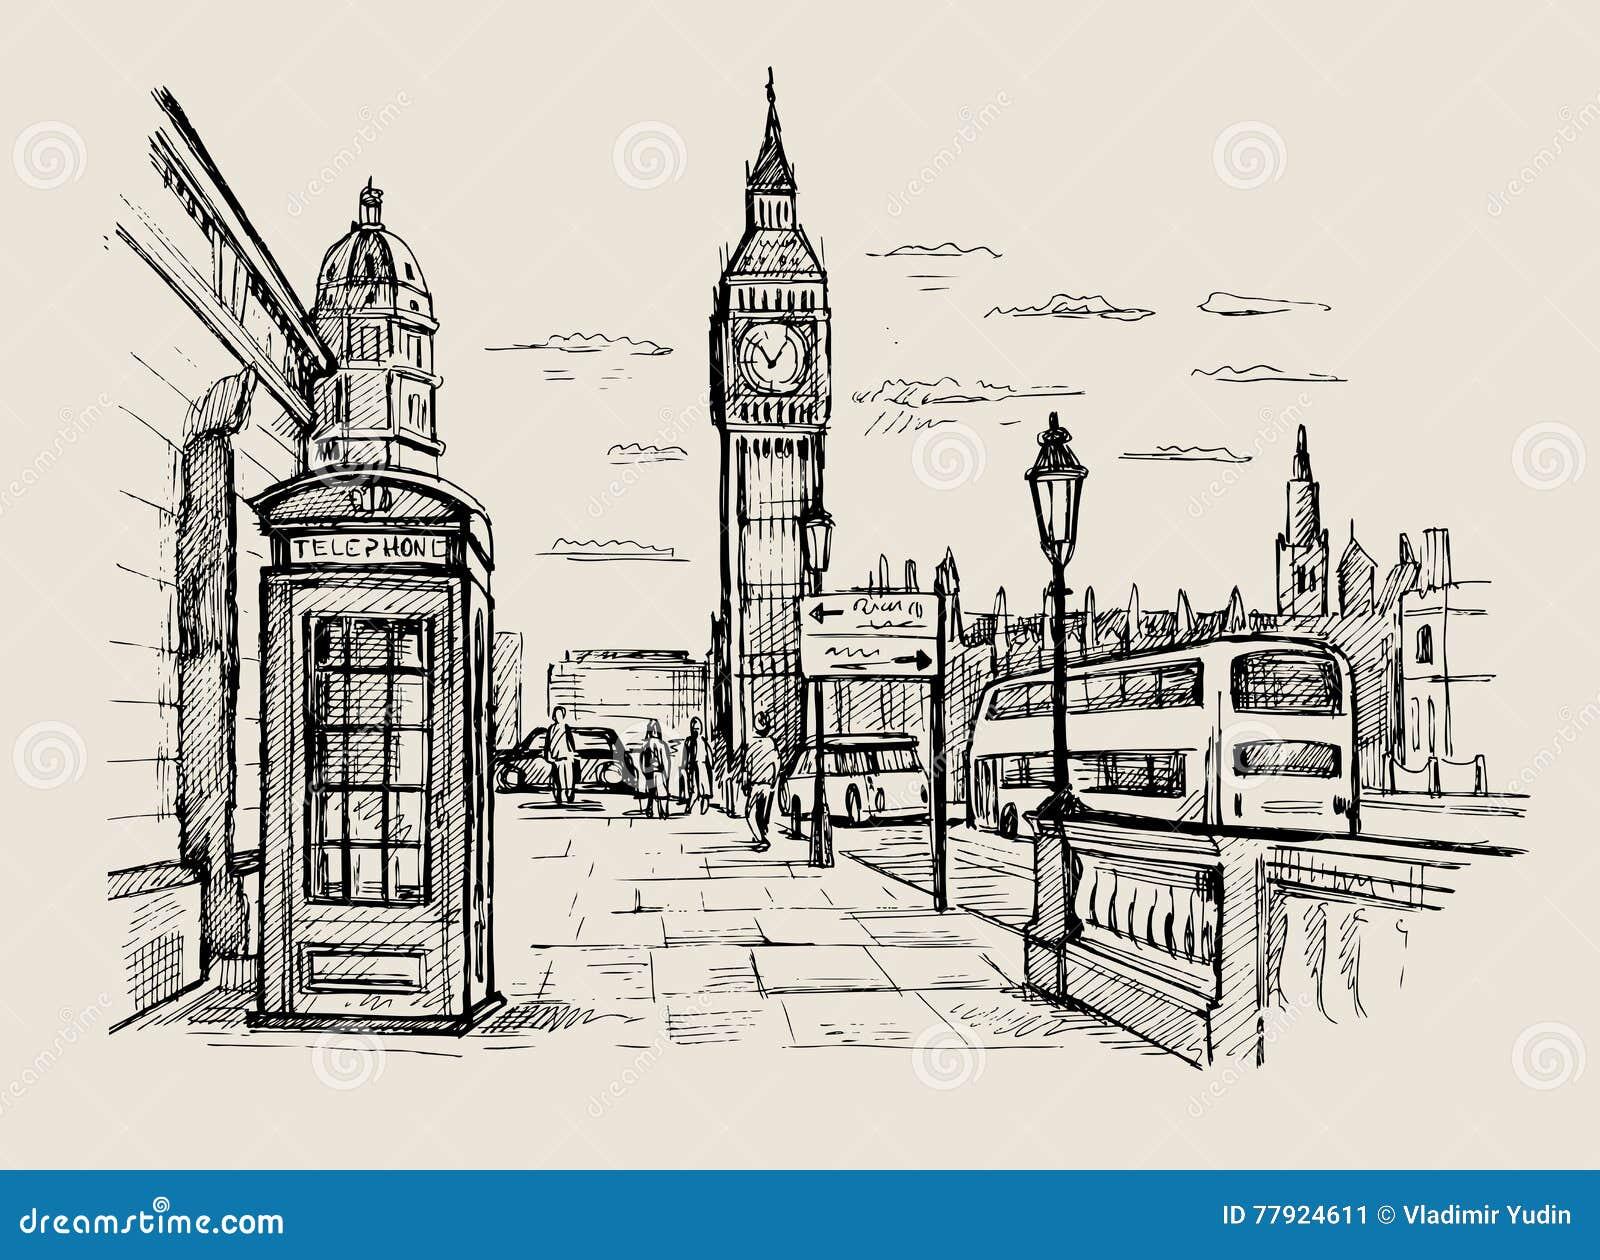 Line Drawing London : Vector hand drawn london stock illustration of